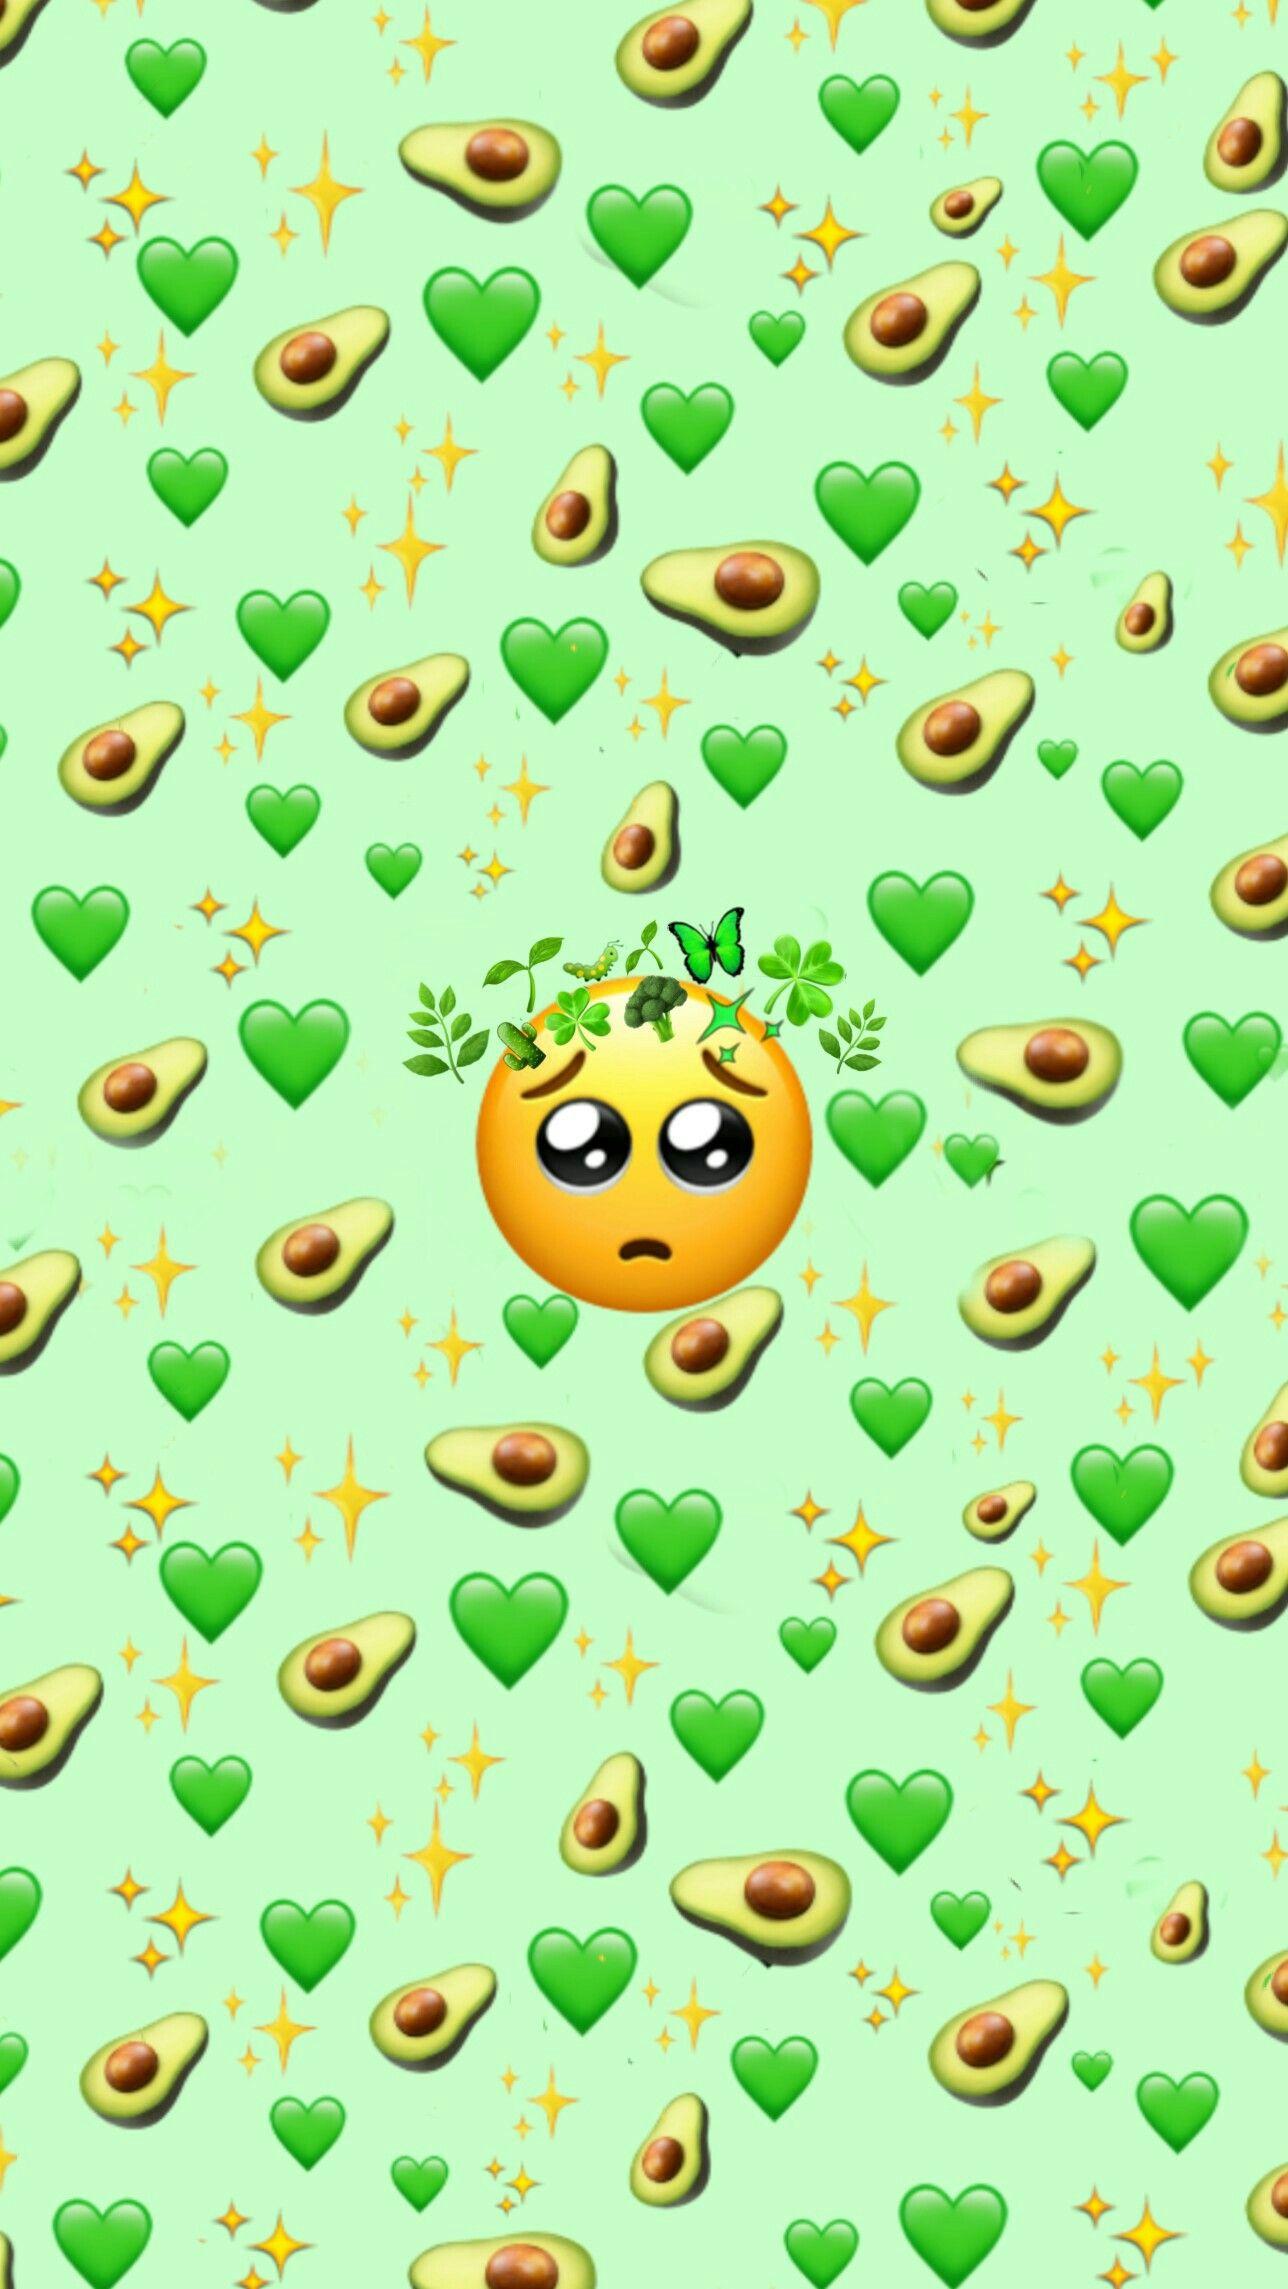 Green Emoji Background Emoji Wallpaper Iphone Emoji Wallpaper Cute Emoji Wallpaper